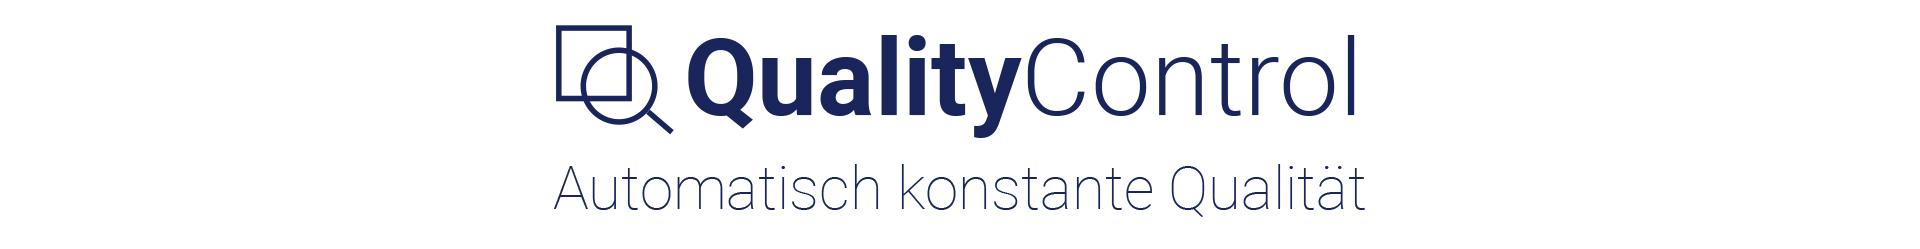 MKN QualityControl Banner